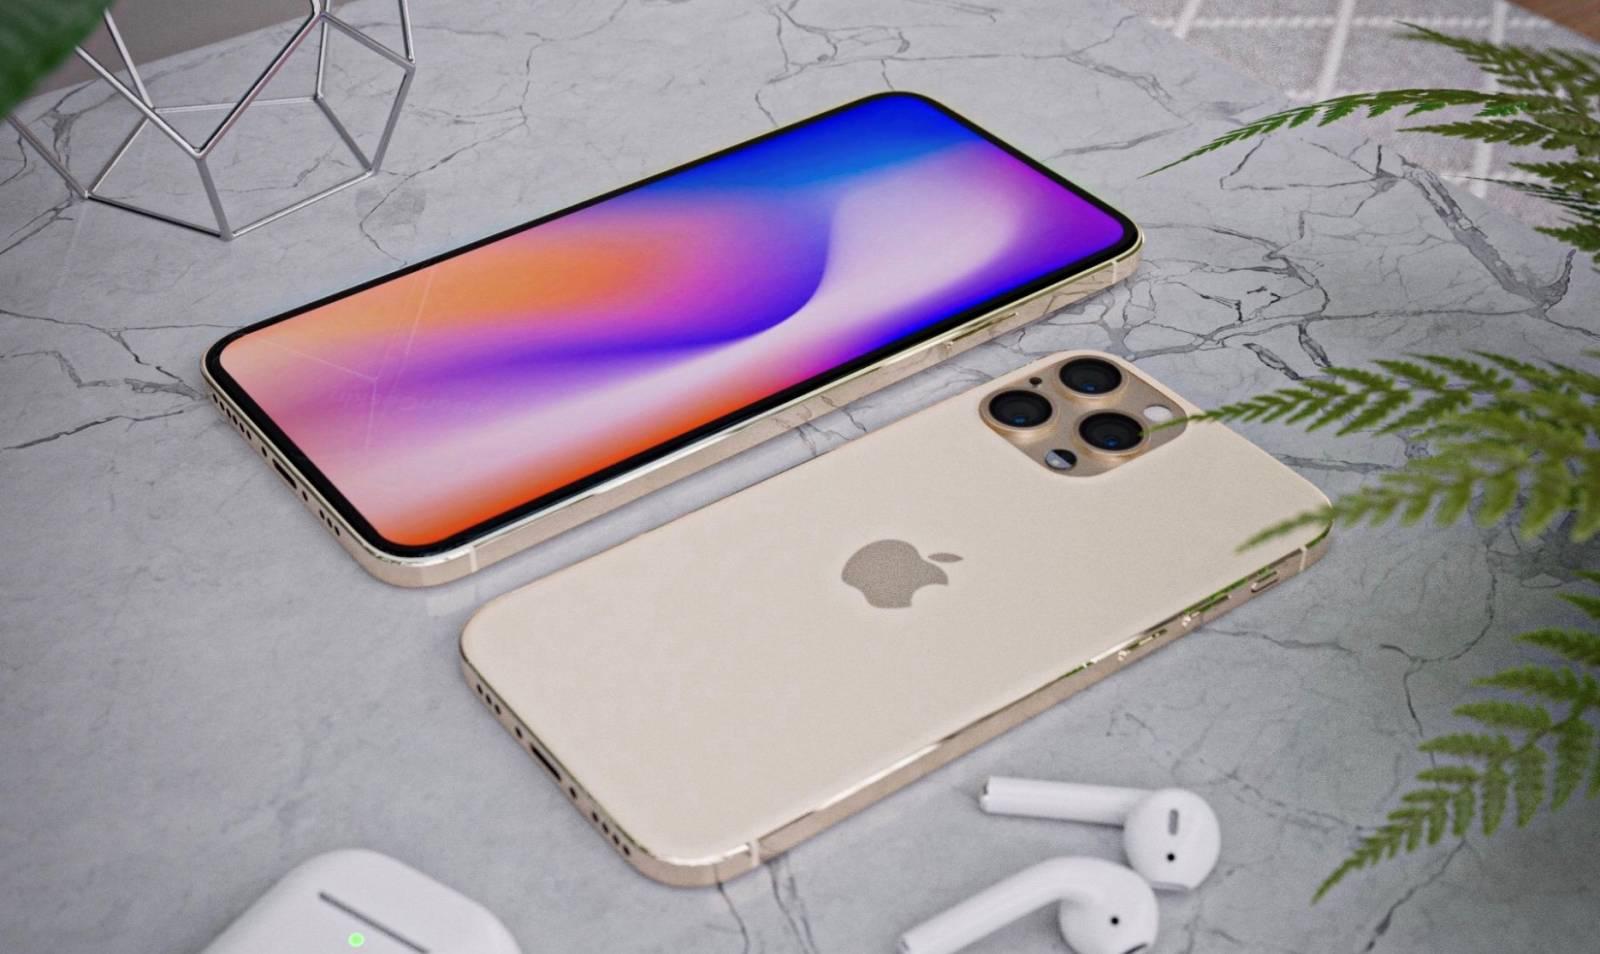 iphone 12 importanta schimbare apple